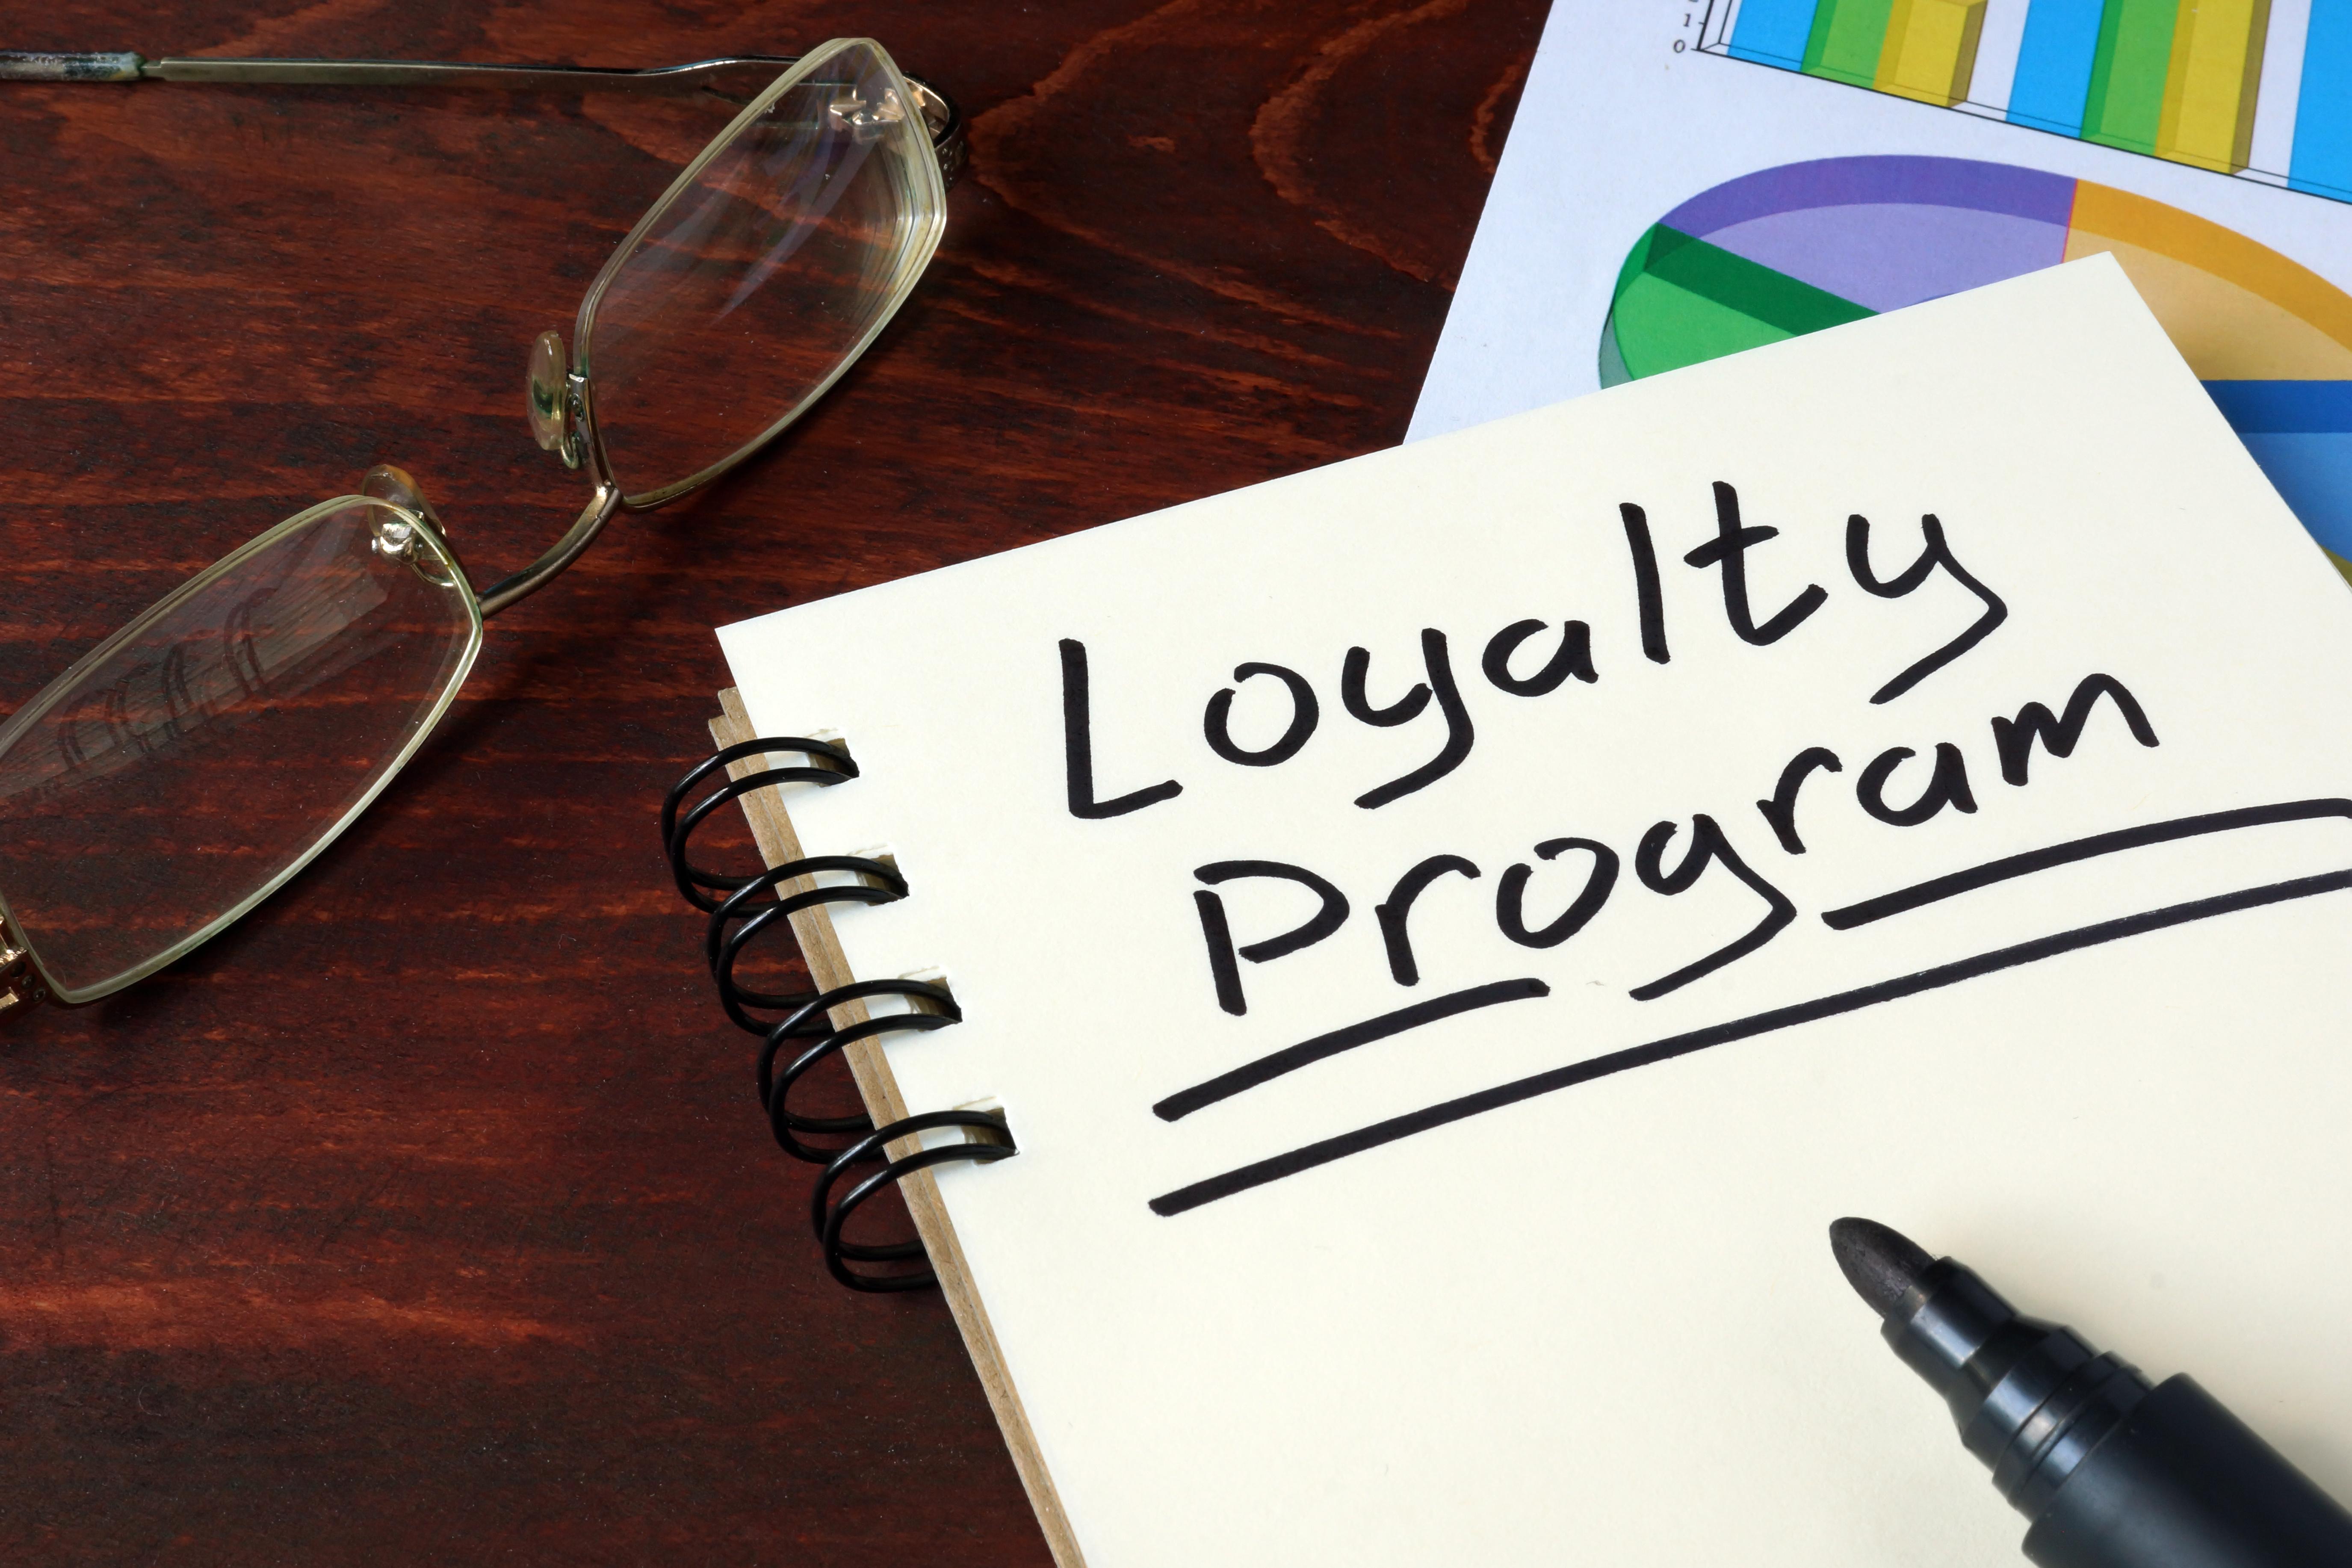 Customer Retention Through Loyalty Programs